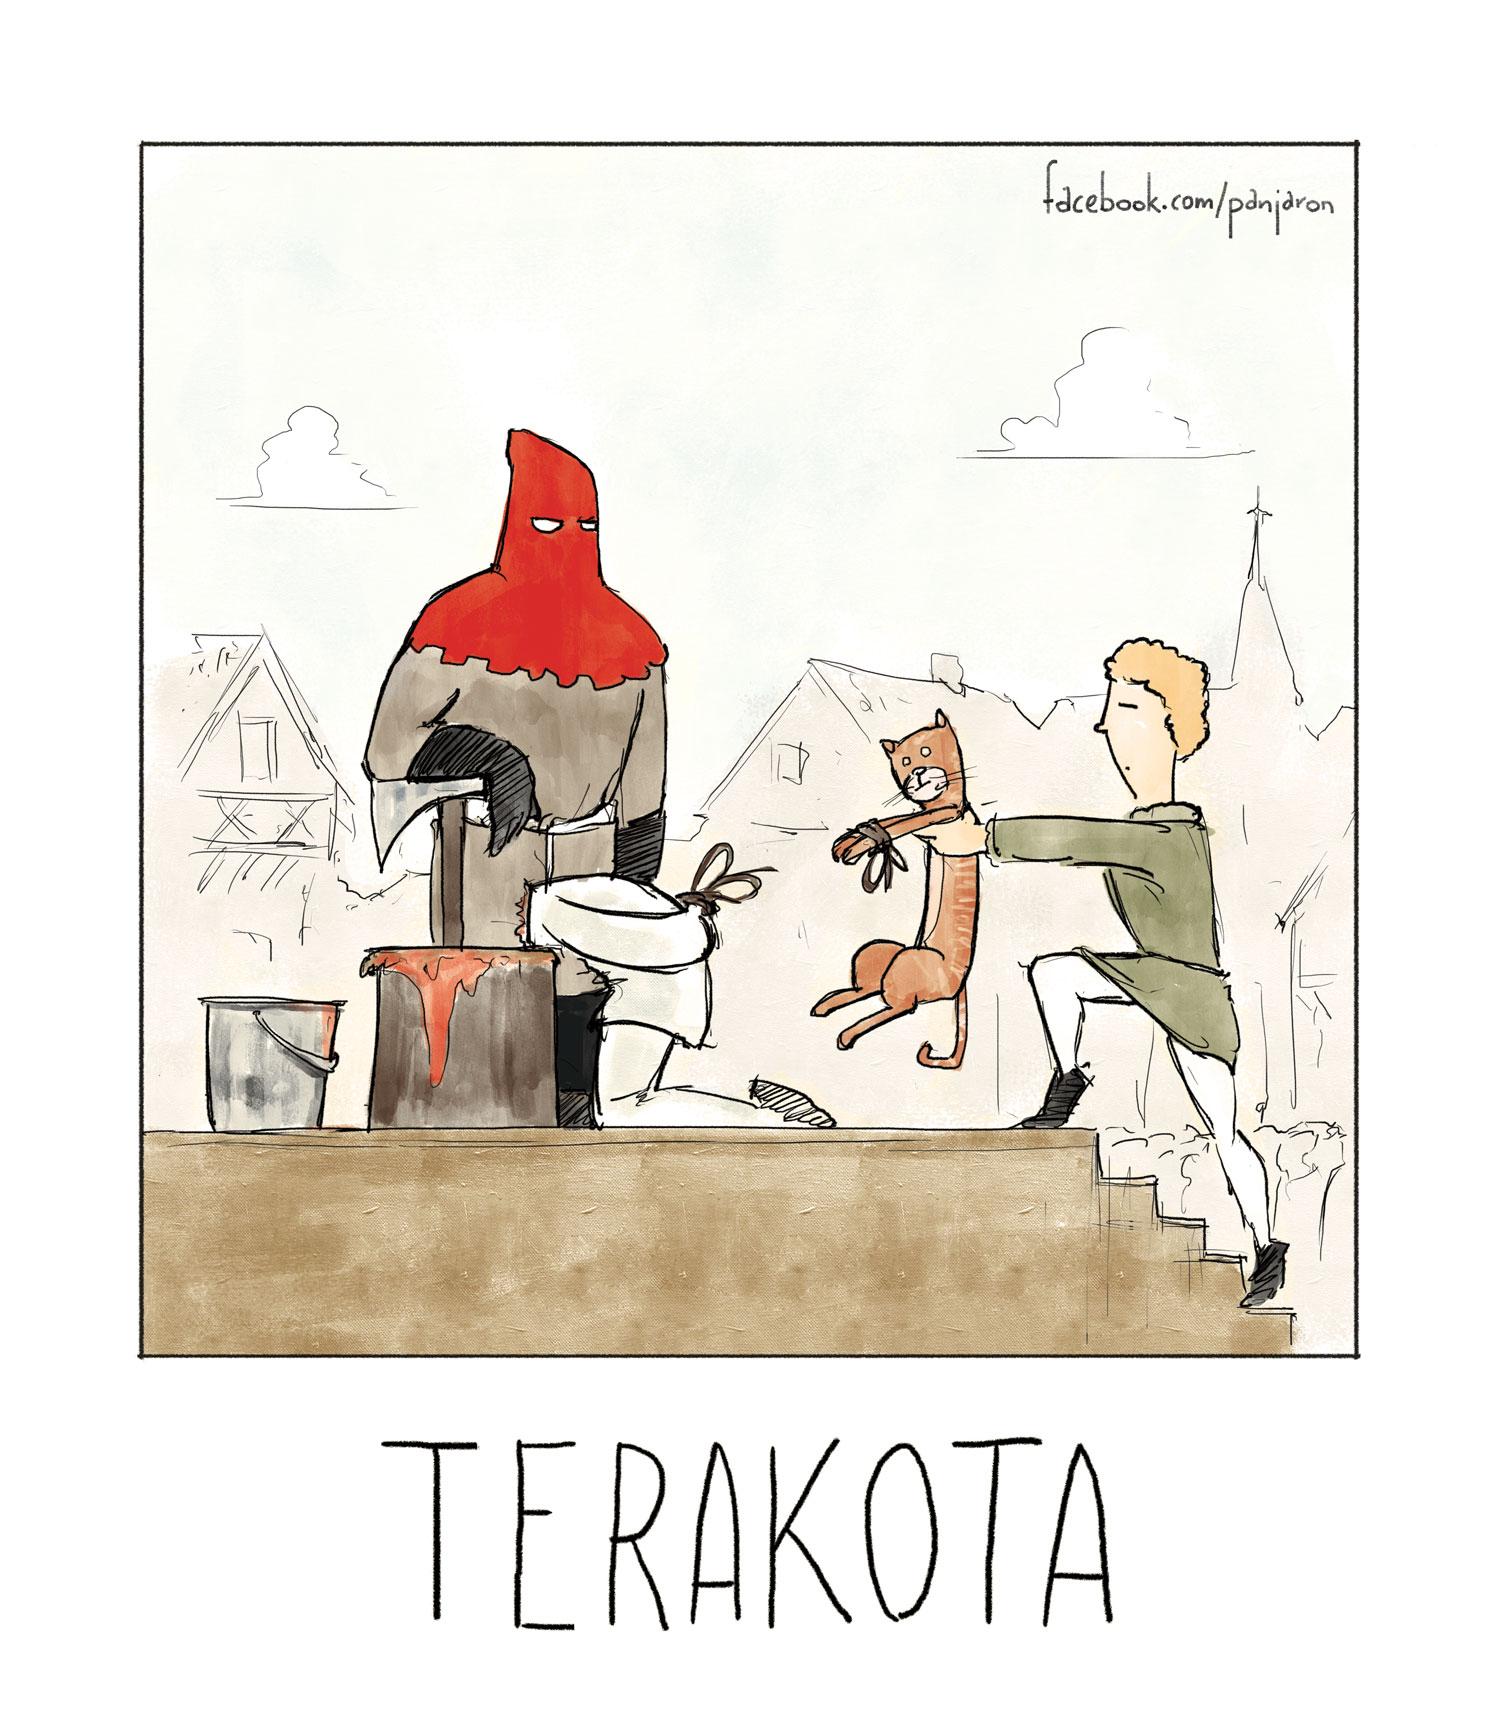 terakota